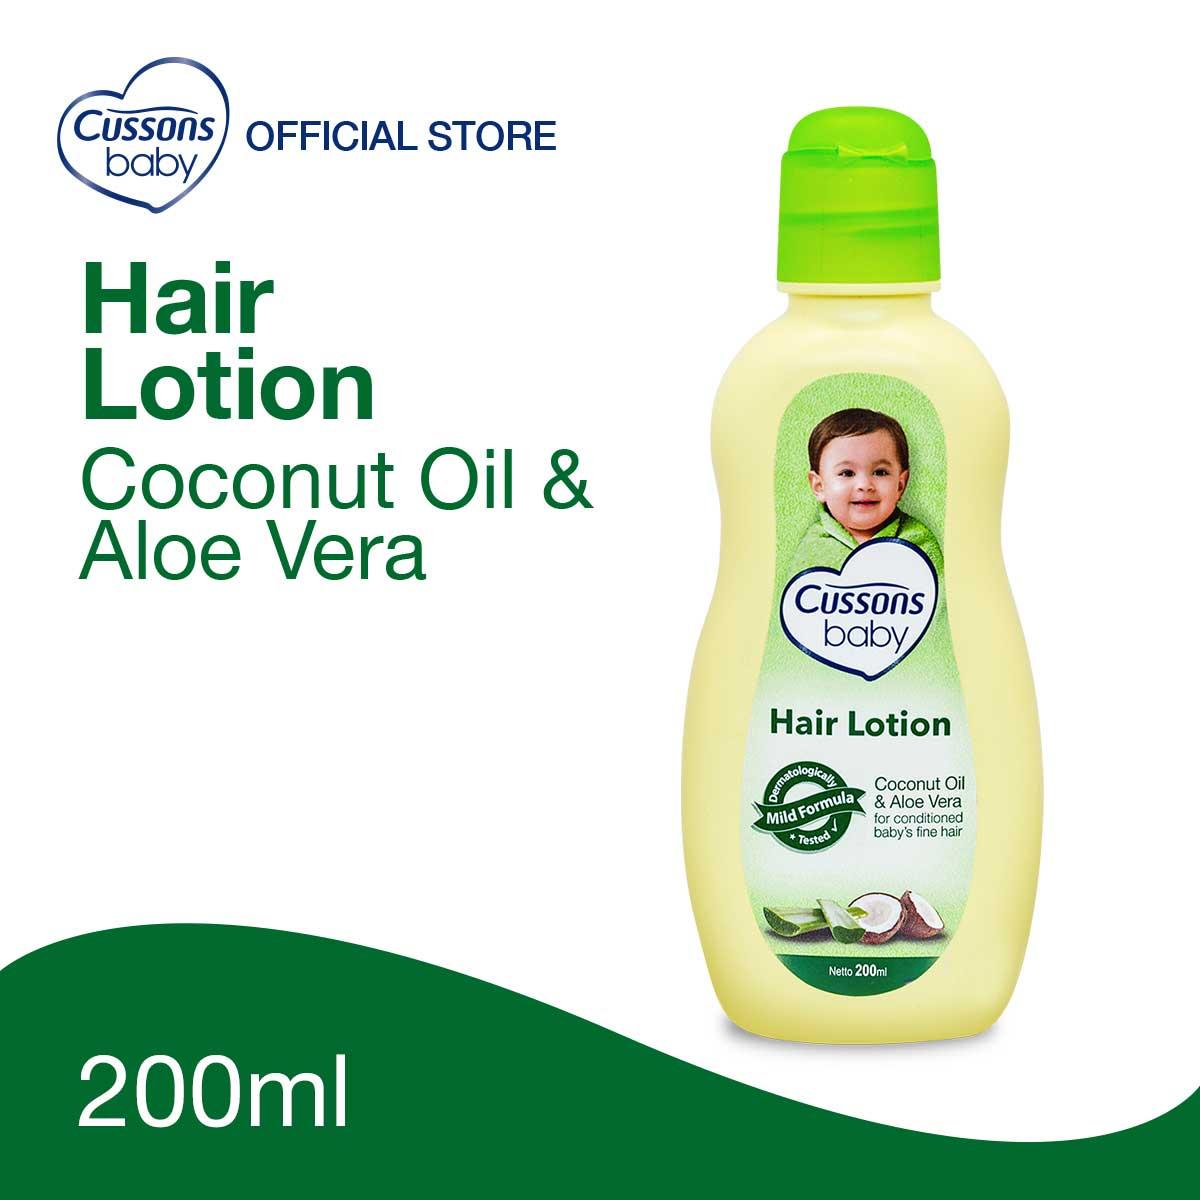 Cussons Baby Hair Lotion Coconut Oil & Aloe Vera 200ml